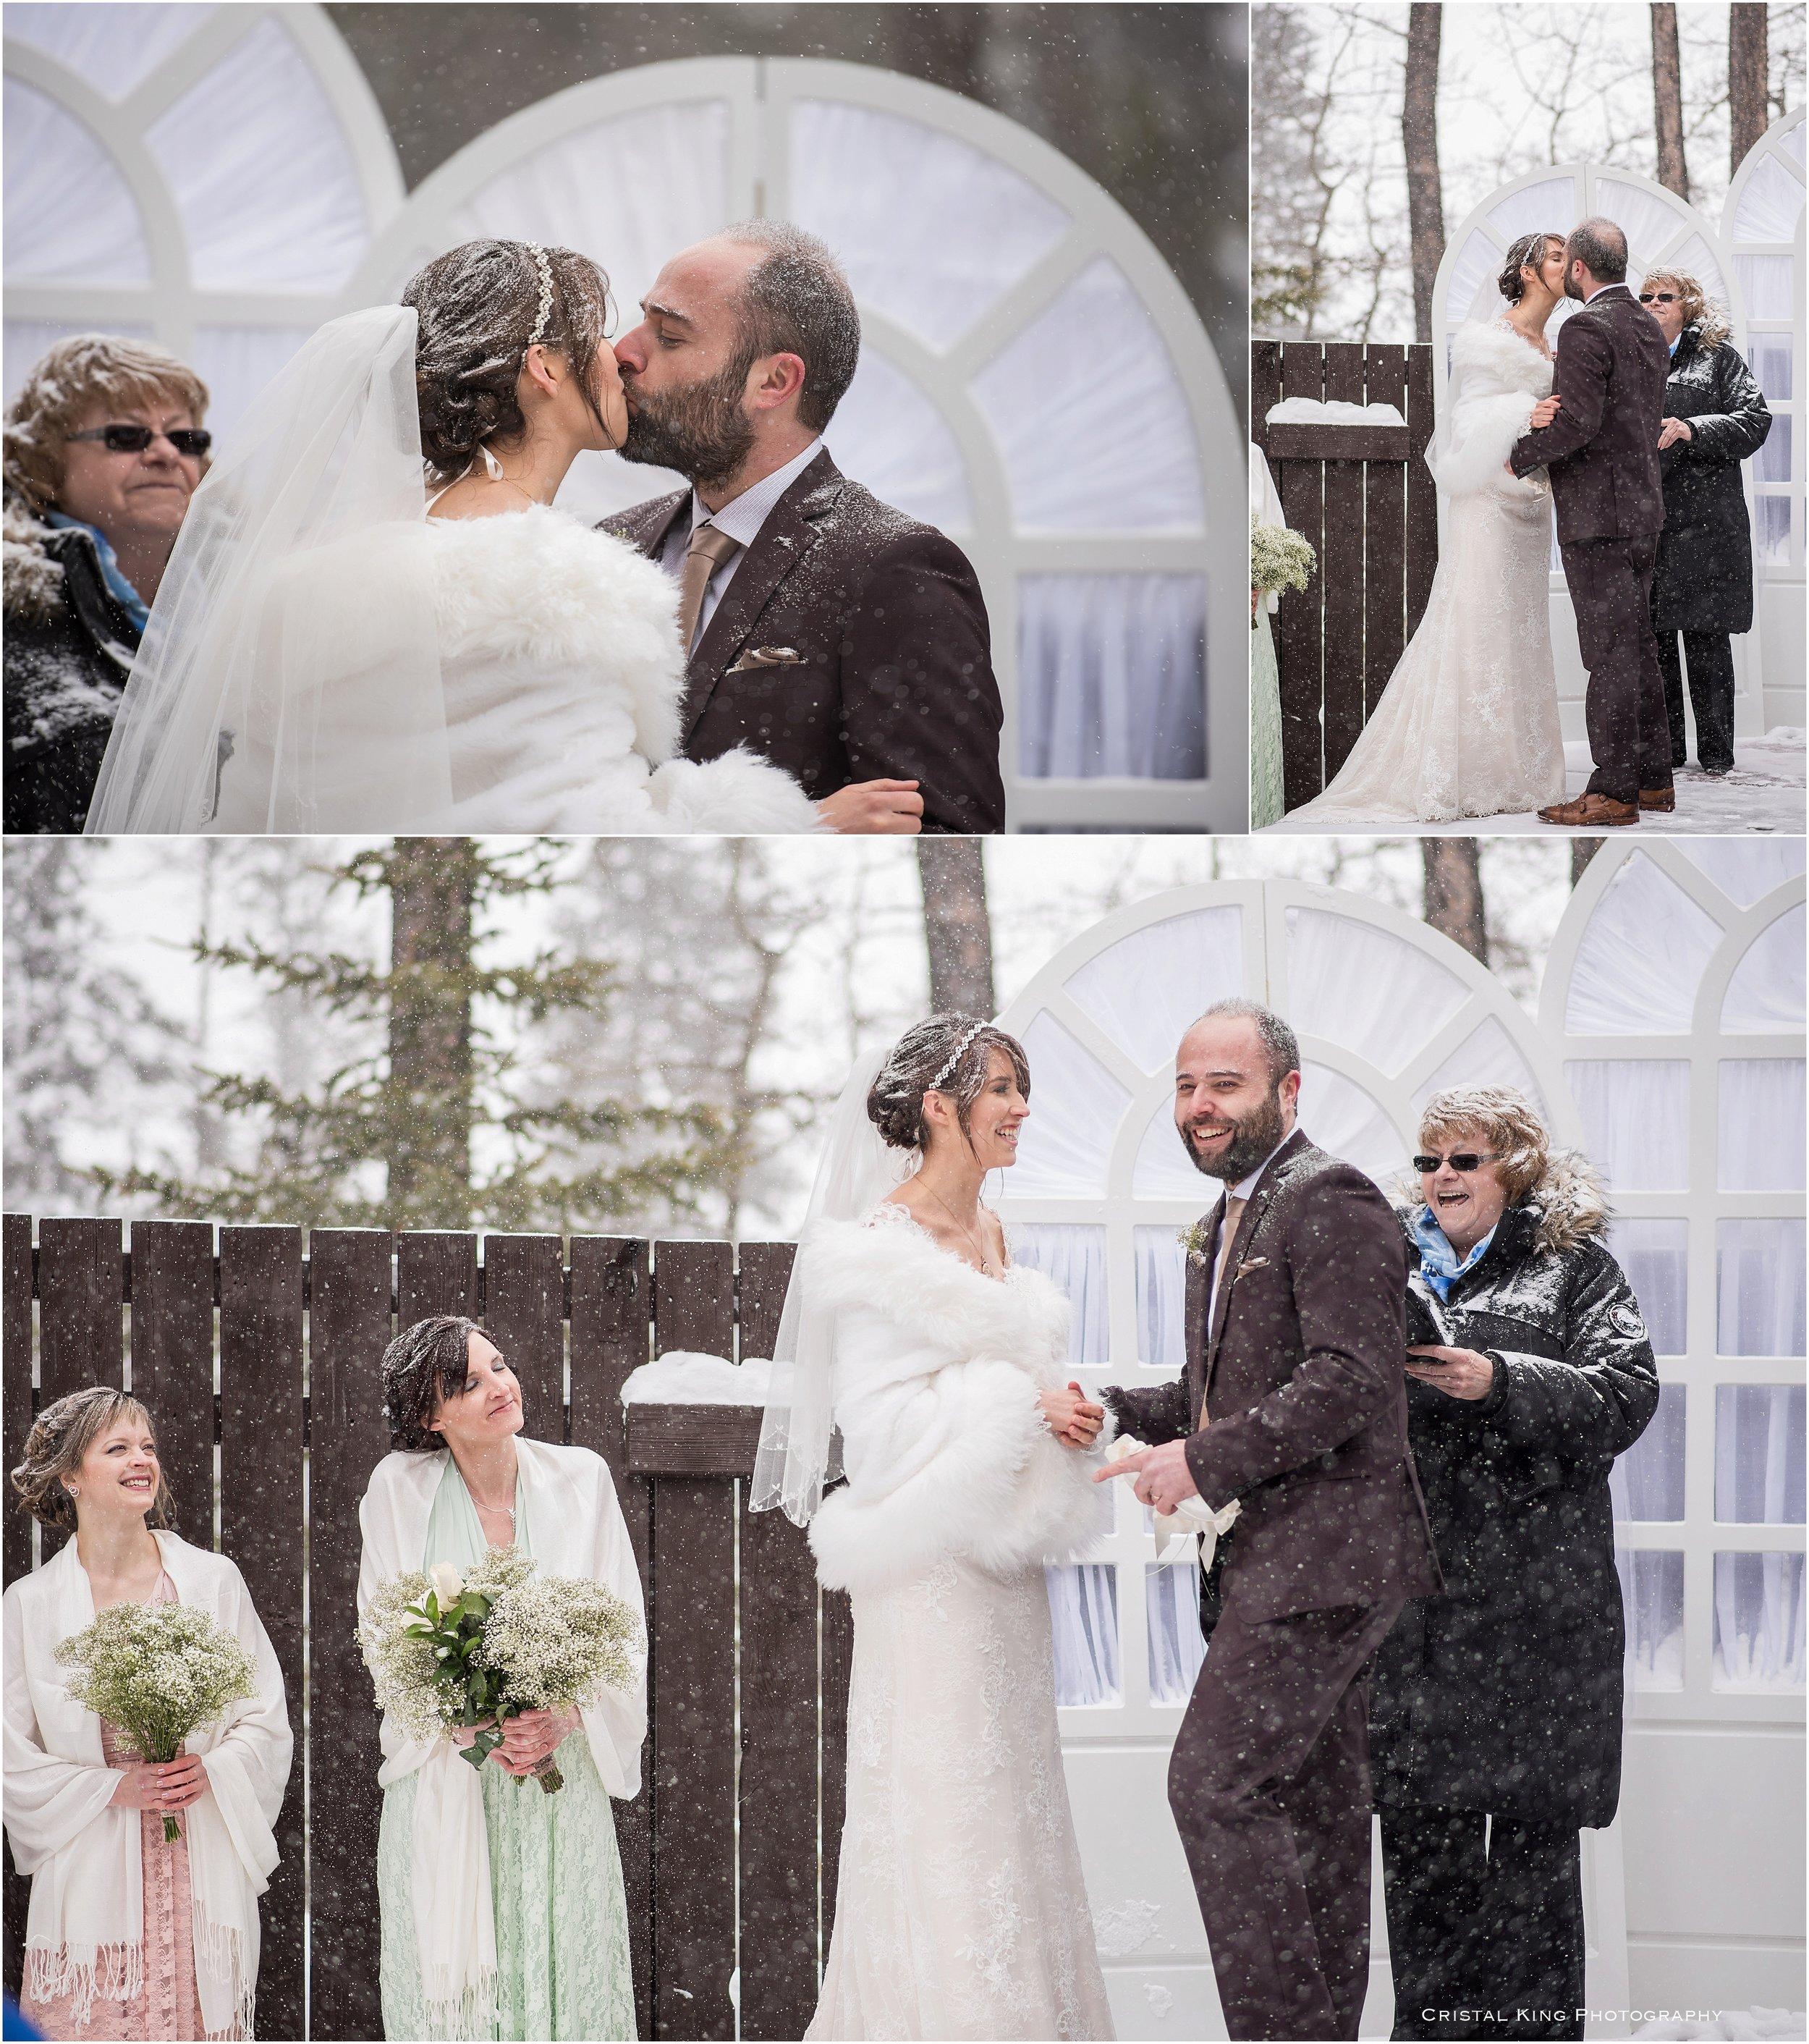 Jacqueline-Jasons-Wedding-36.jpg